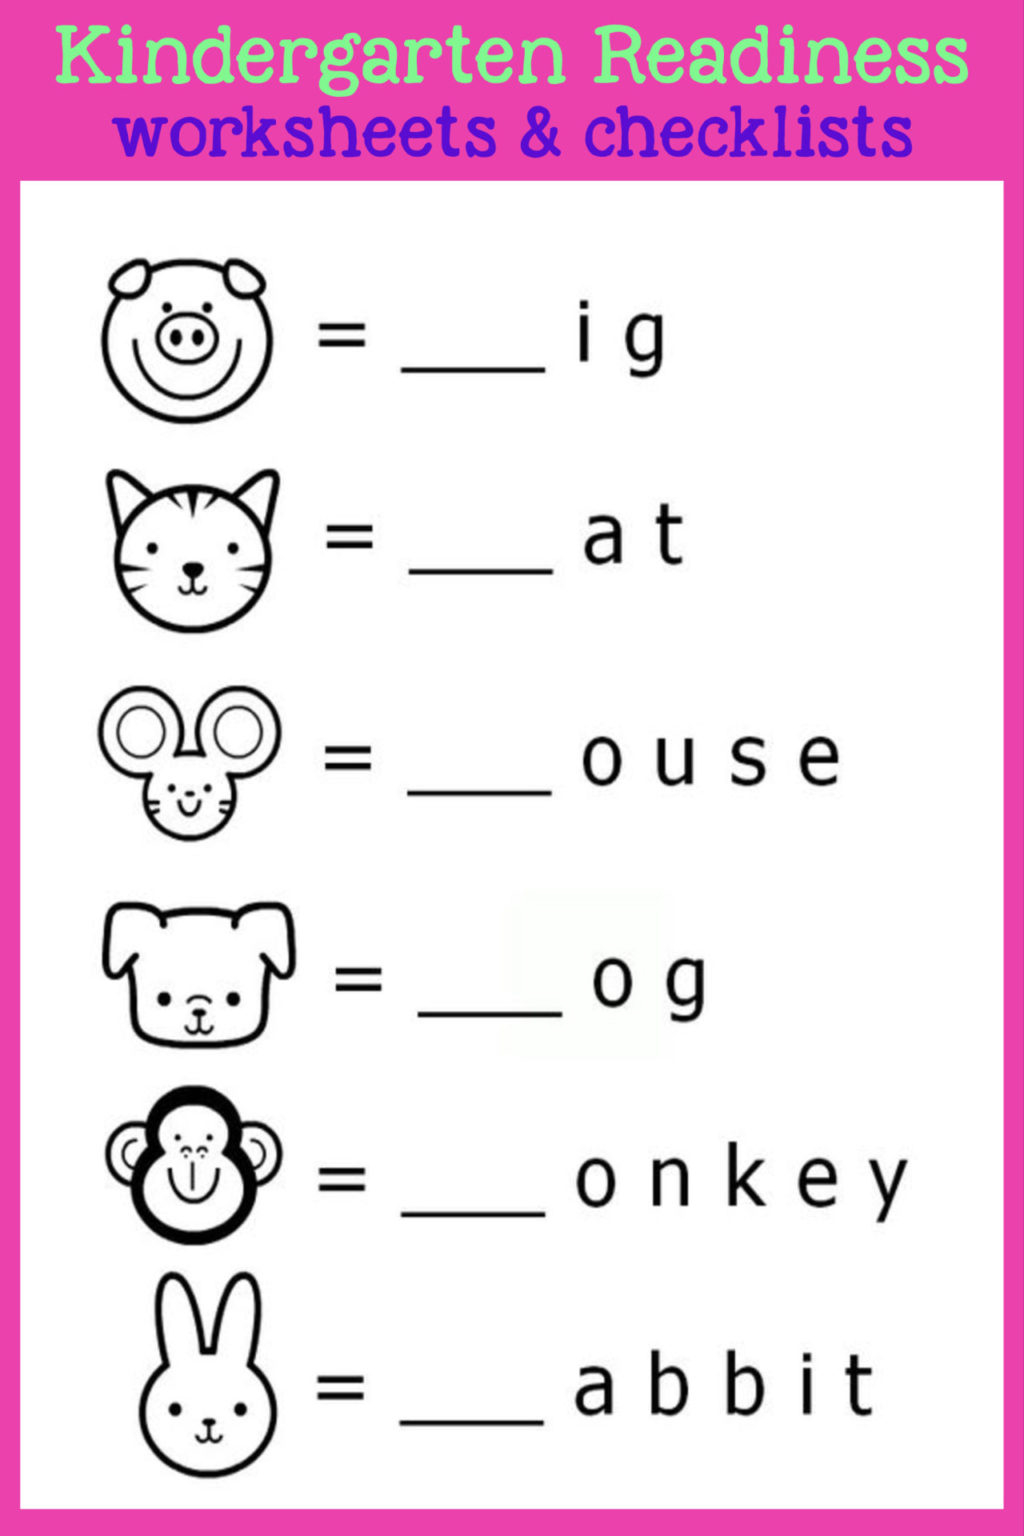 Worksheet ~ Kindergarten Readiness Checklists Free Printable